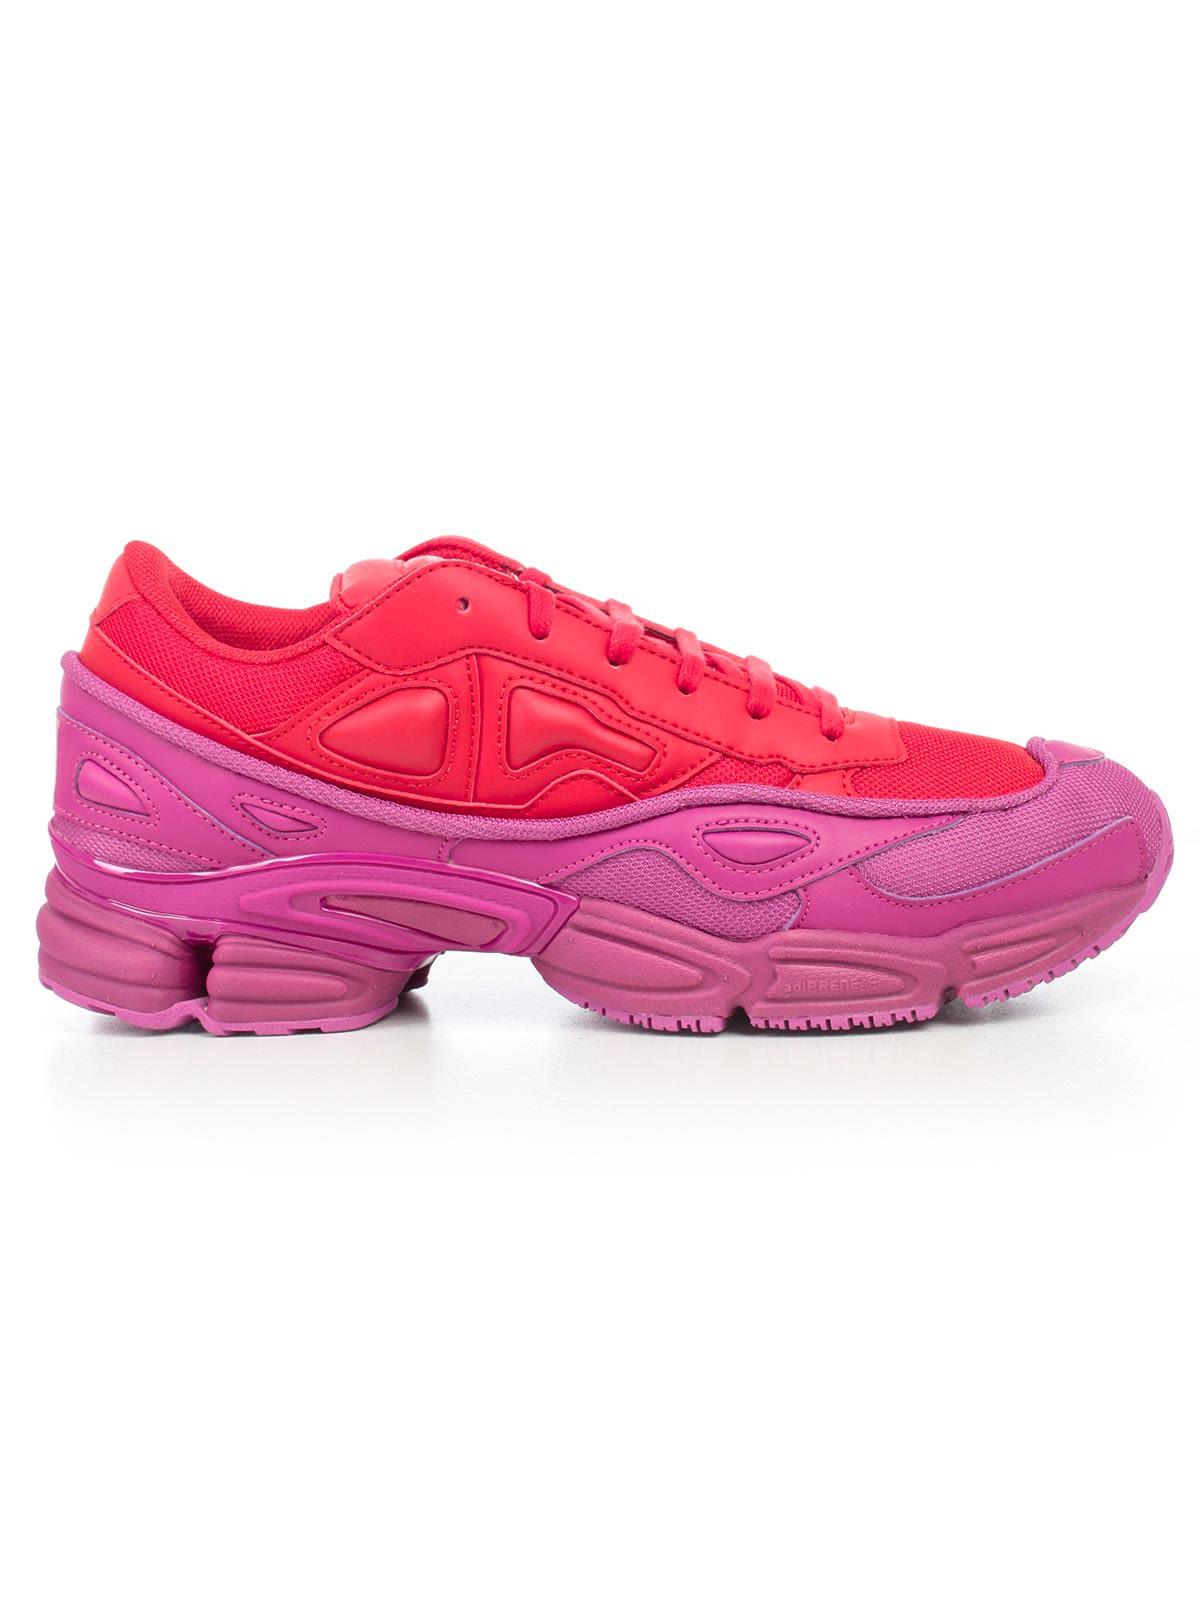 b23ec74ad371d Adidas By Raf Simons Adidas X Raf Simons Rs Ozweego Sneakers - Basic ...